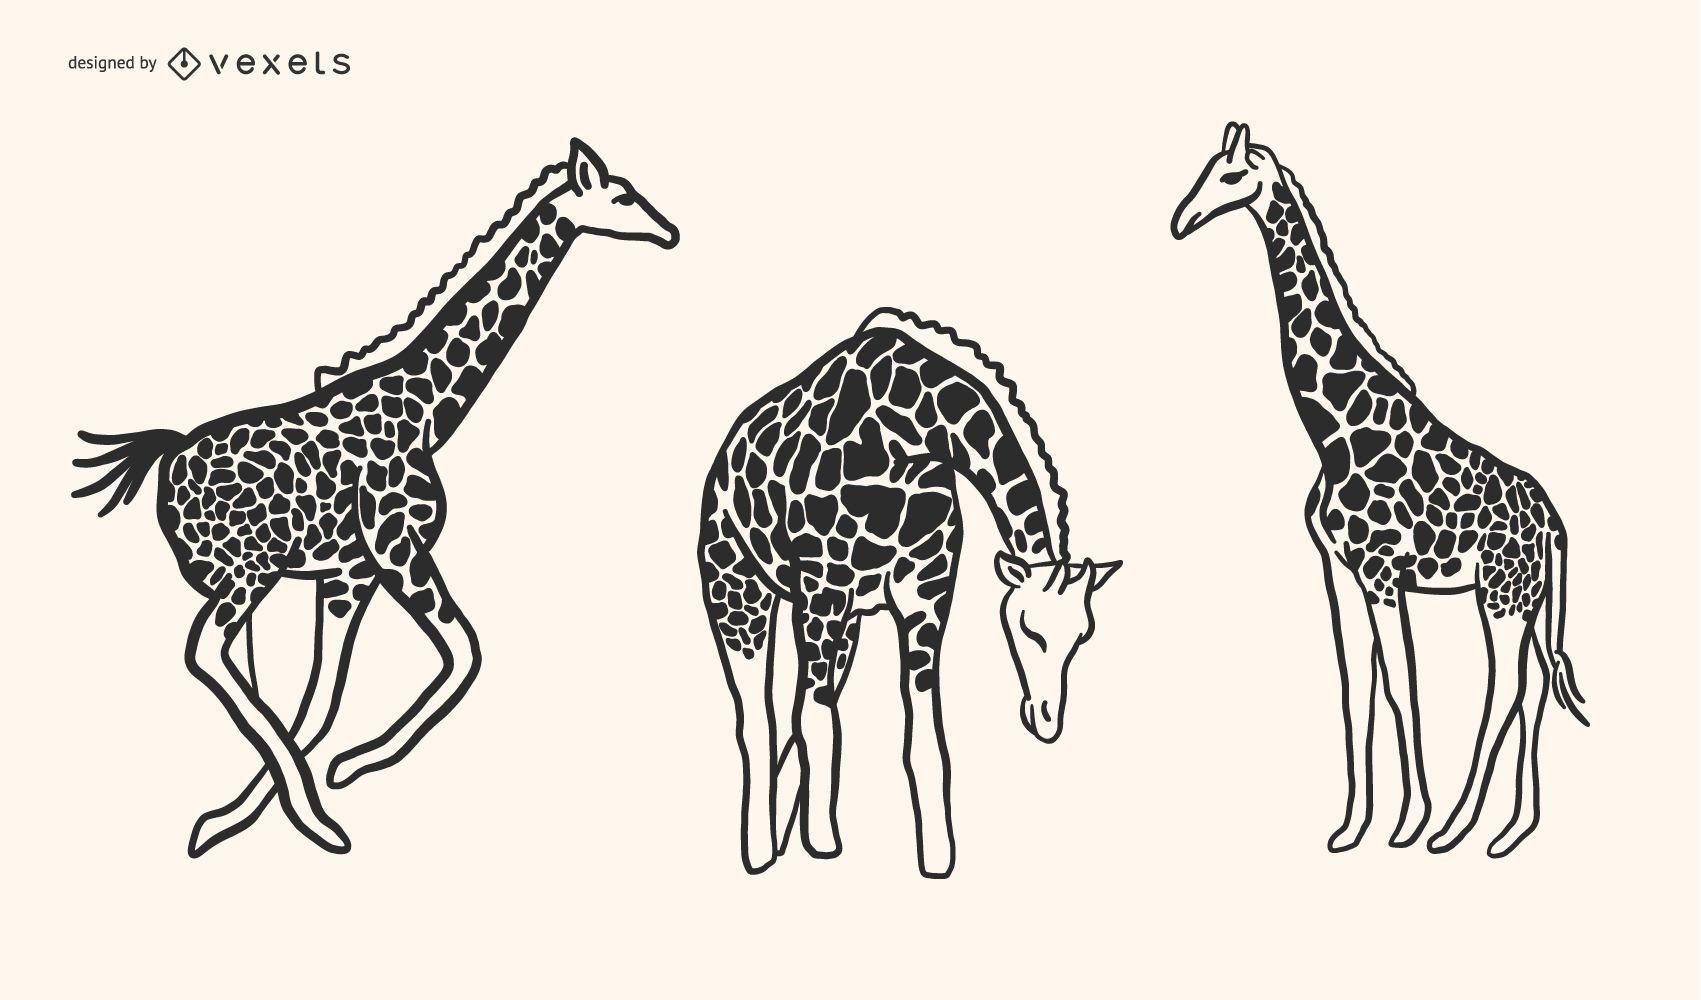 Desenho de vetor de estilo girafa Doodle